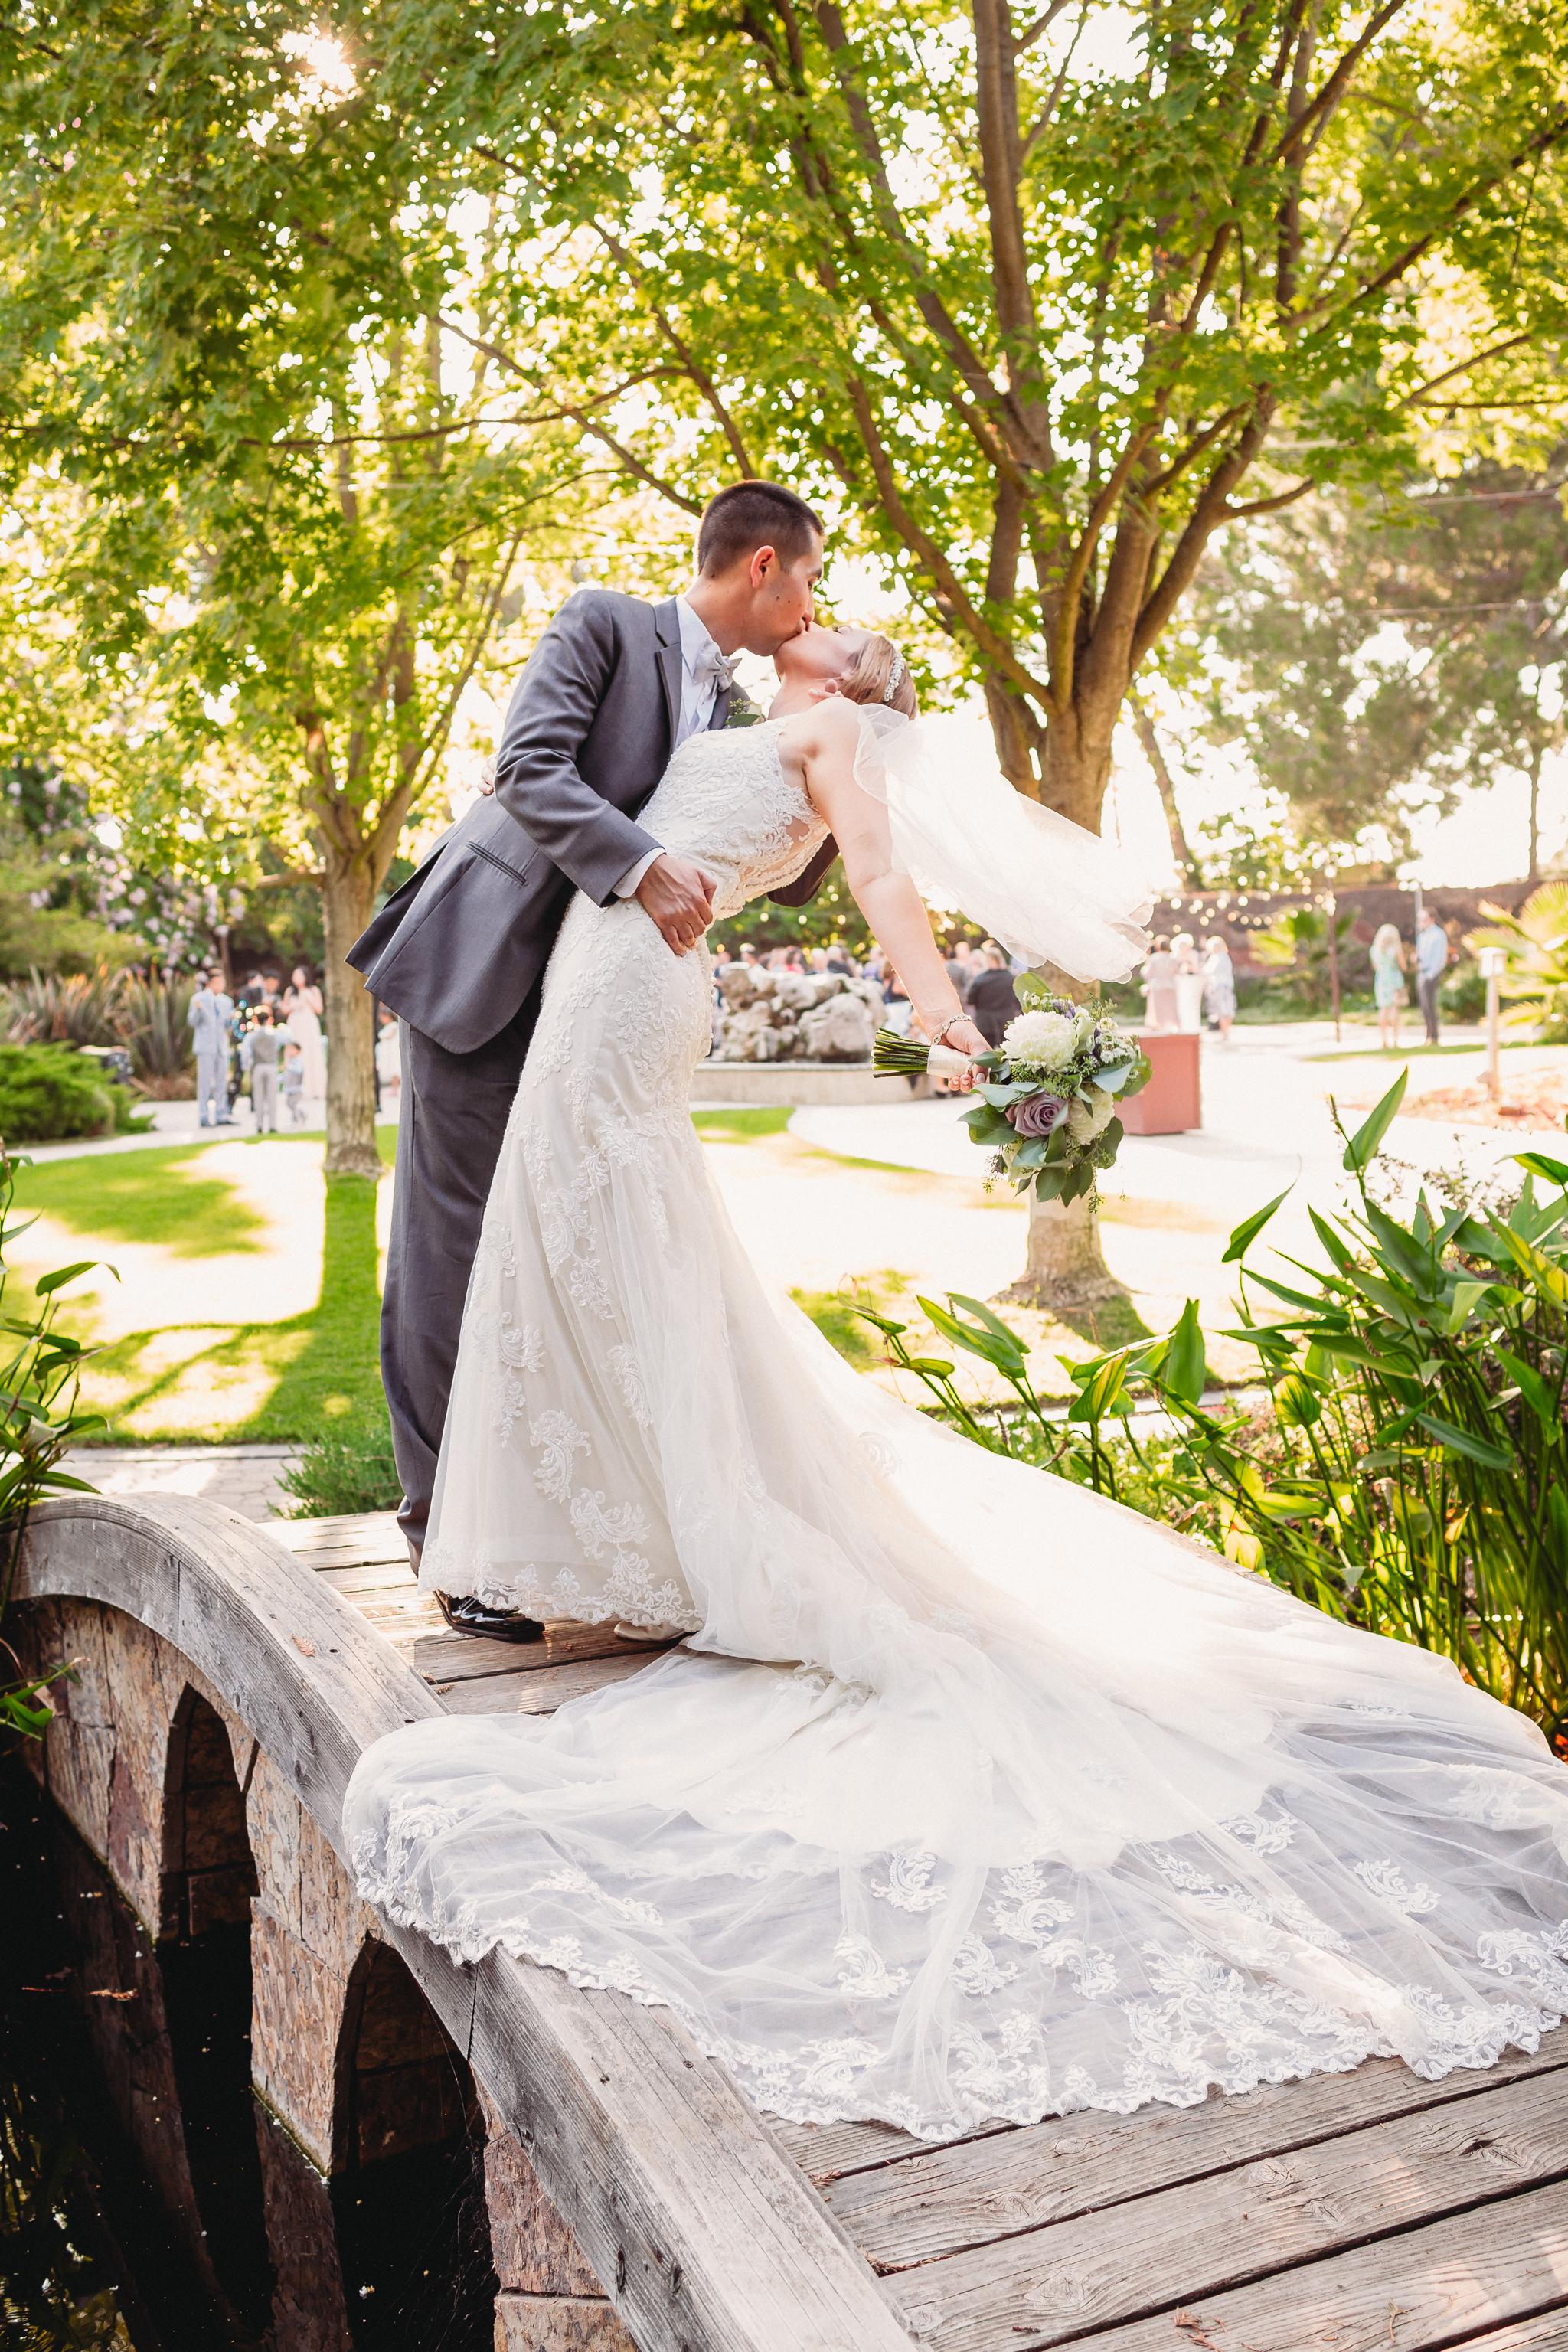 rebeccaylasotras-bay-area-garden-wedding-58.jpg